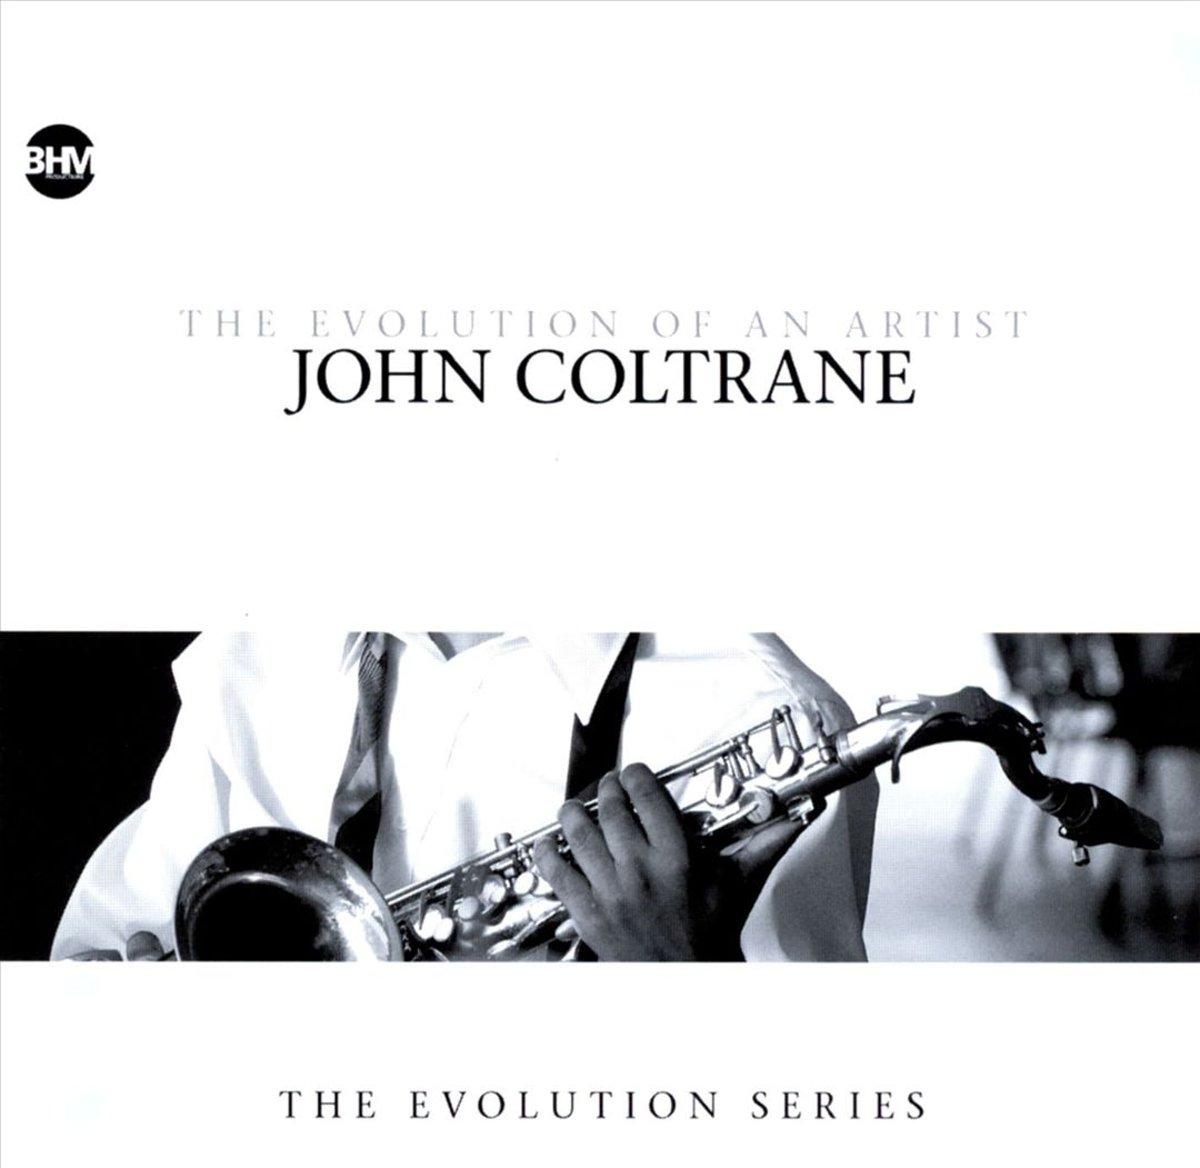 Джон Колтрейн John Coltrane. John Coltrane - The Evolution Of An Artist (2 CD) джон колтрейн john coltrane giant steps the best of the early years 10 cd